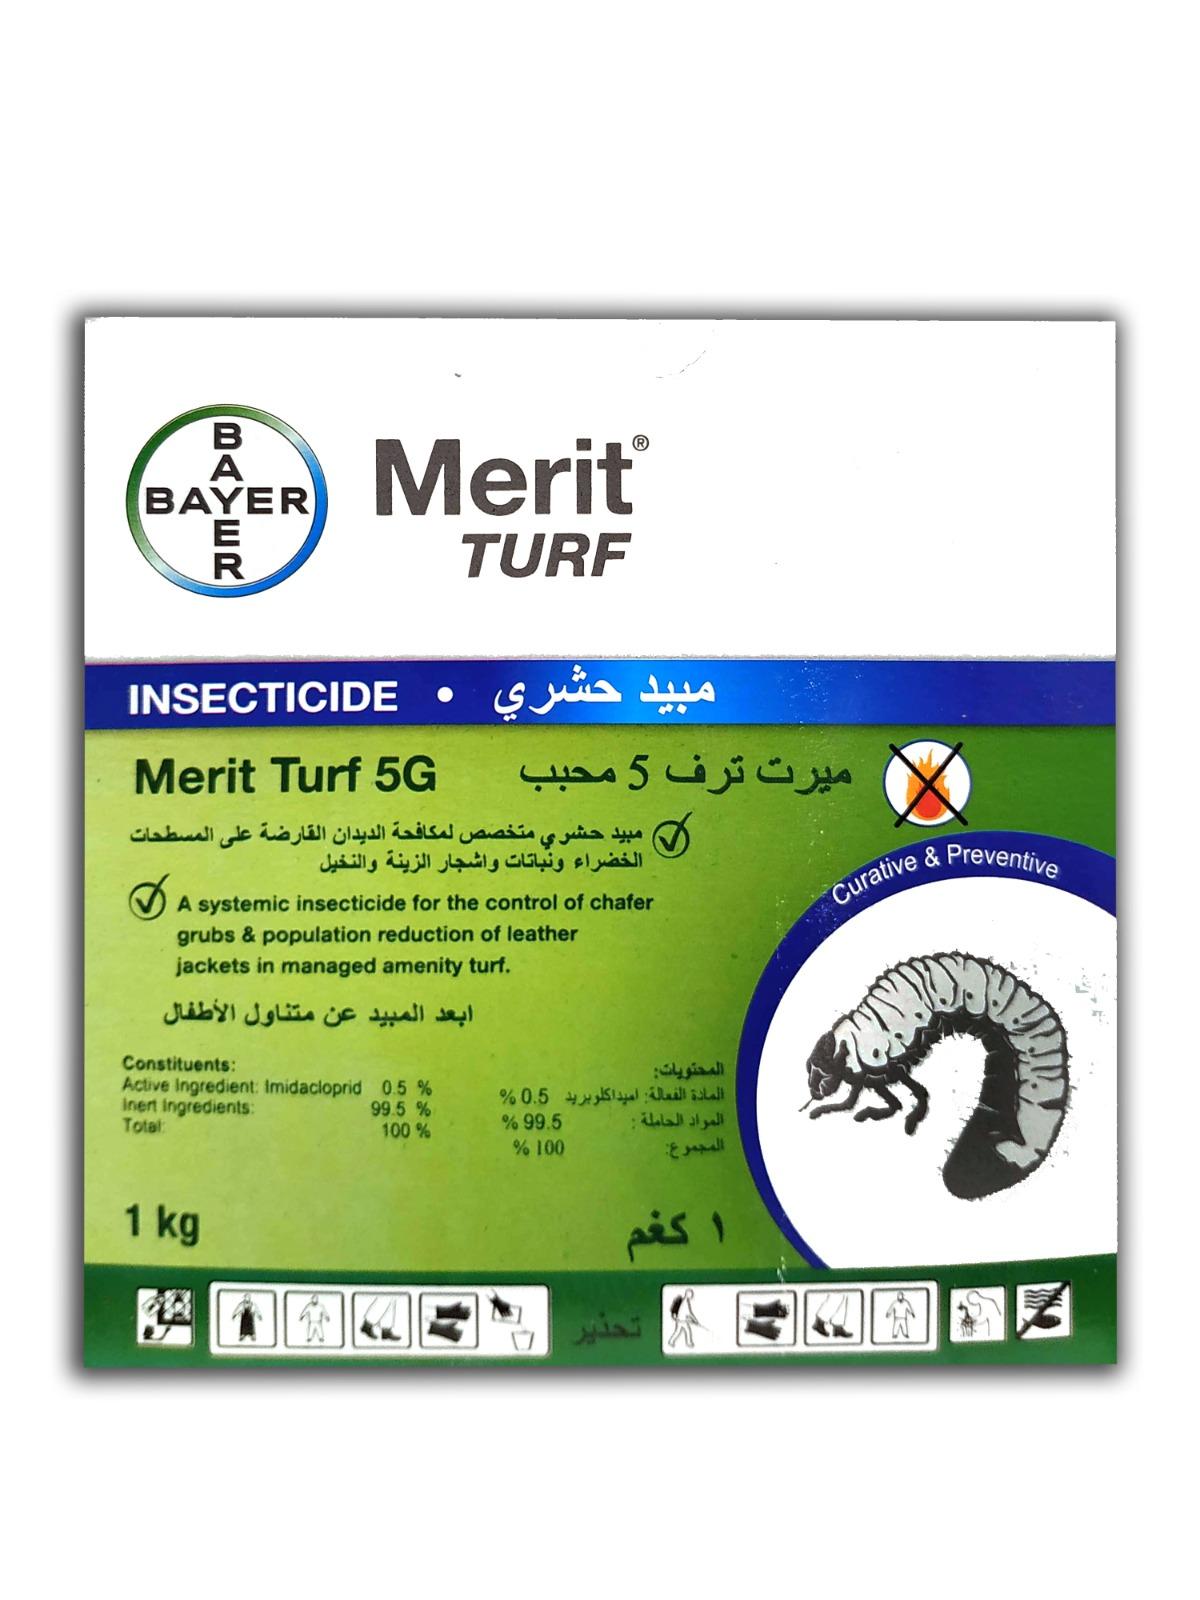 Merit Turf Soil Fertilizer Pesticide